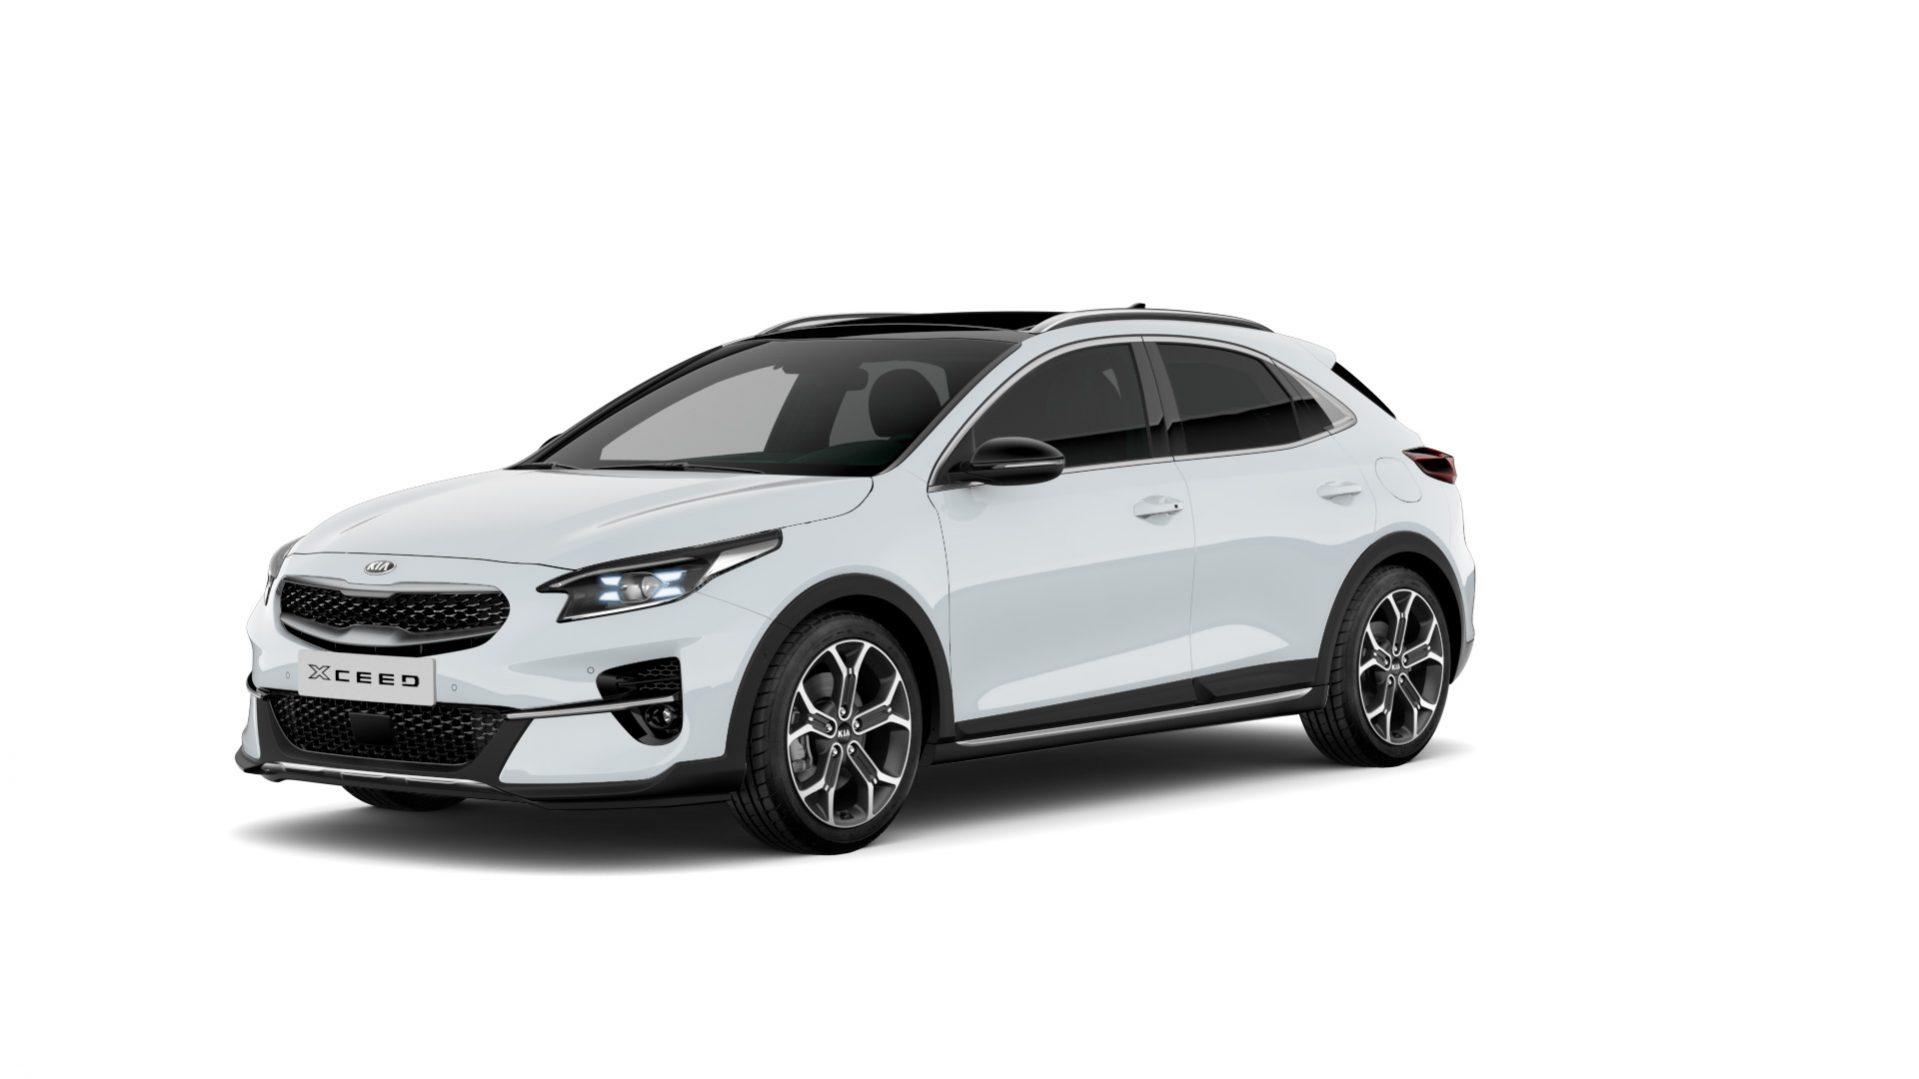 KIA XCEED OPTIMUM 1.5T 160HP 48V HYBRID 2021